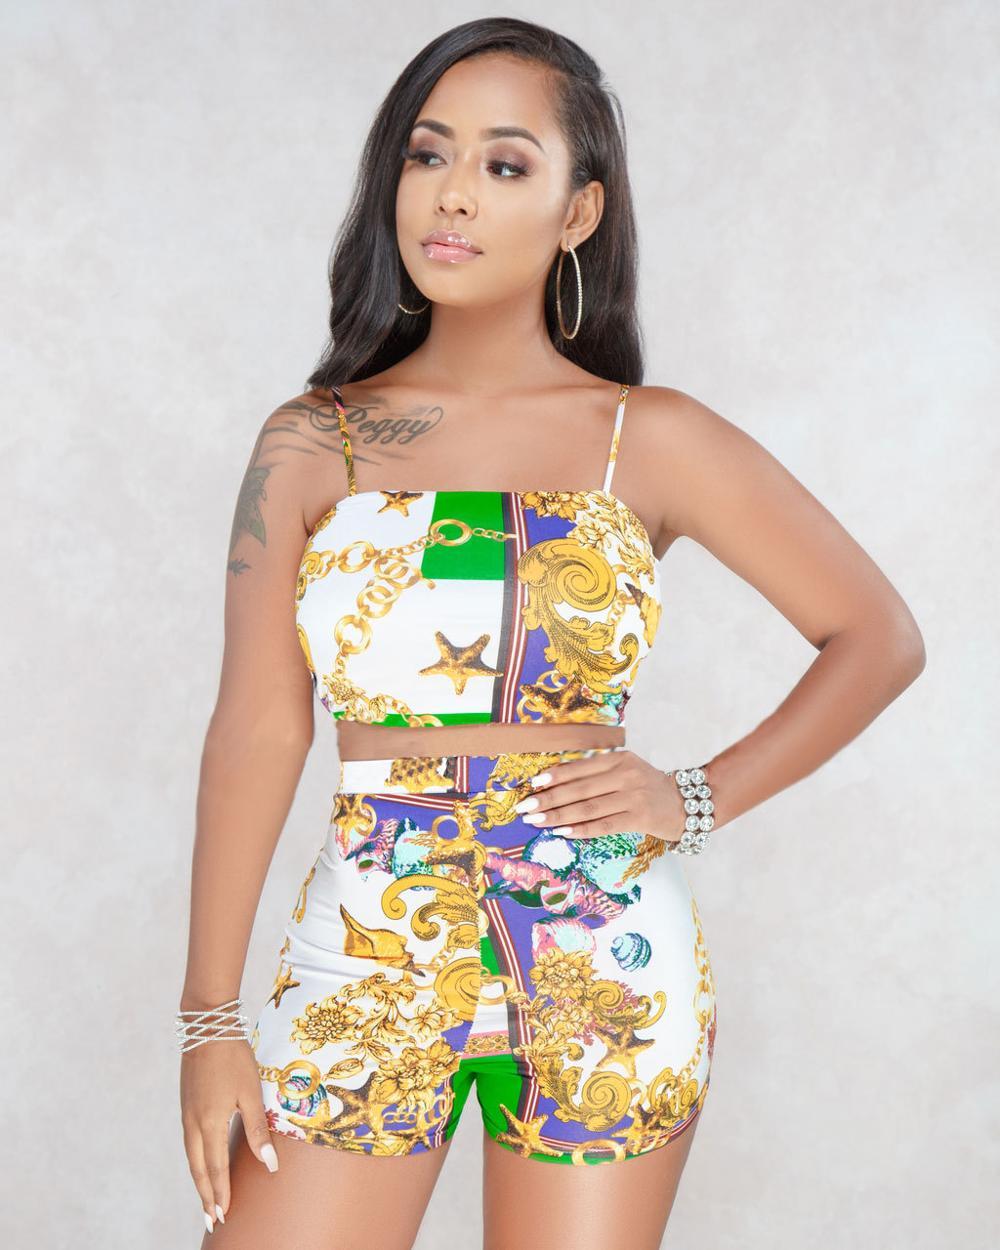 9011 Backless Blouse Hot Shorts Floral Two Piece Set Women - Buy Two Piece  Set Women Clothing Sexy b7c00b2eca